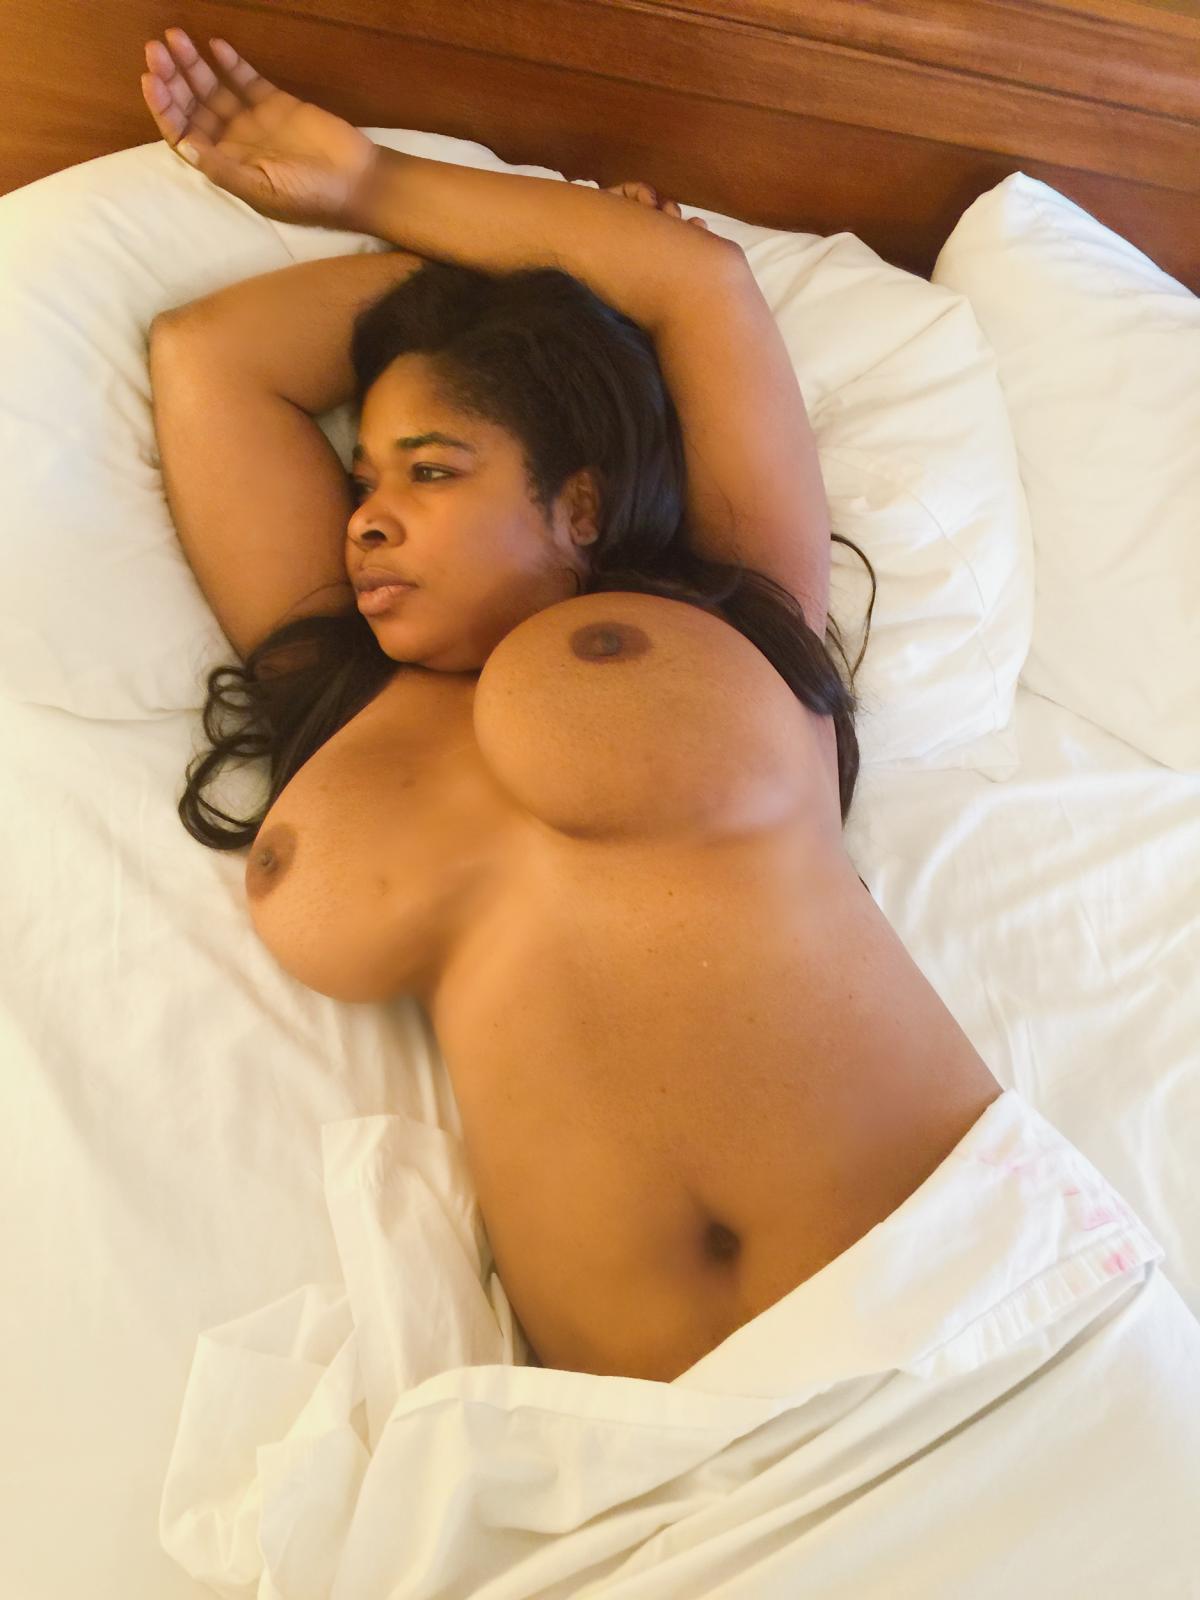 Big pussy igbo girl porn pics